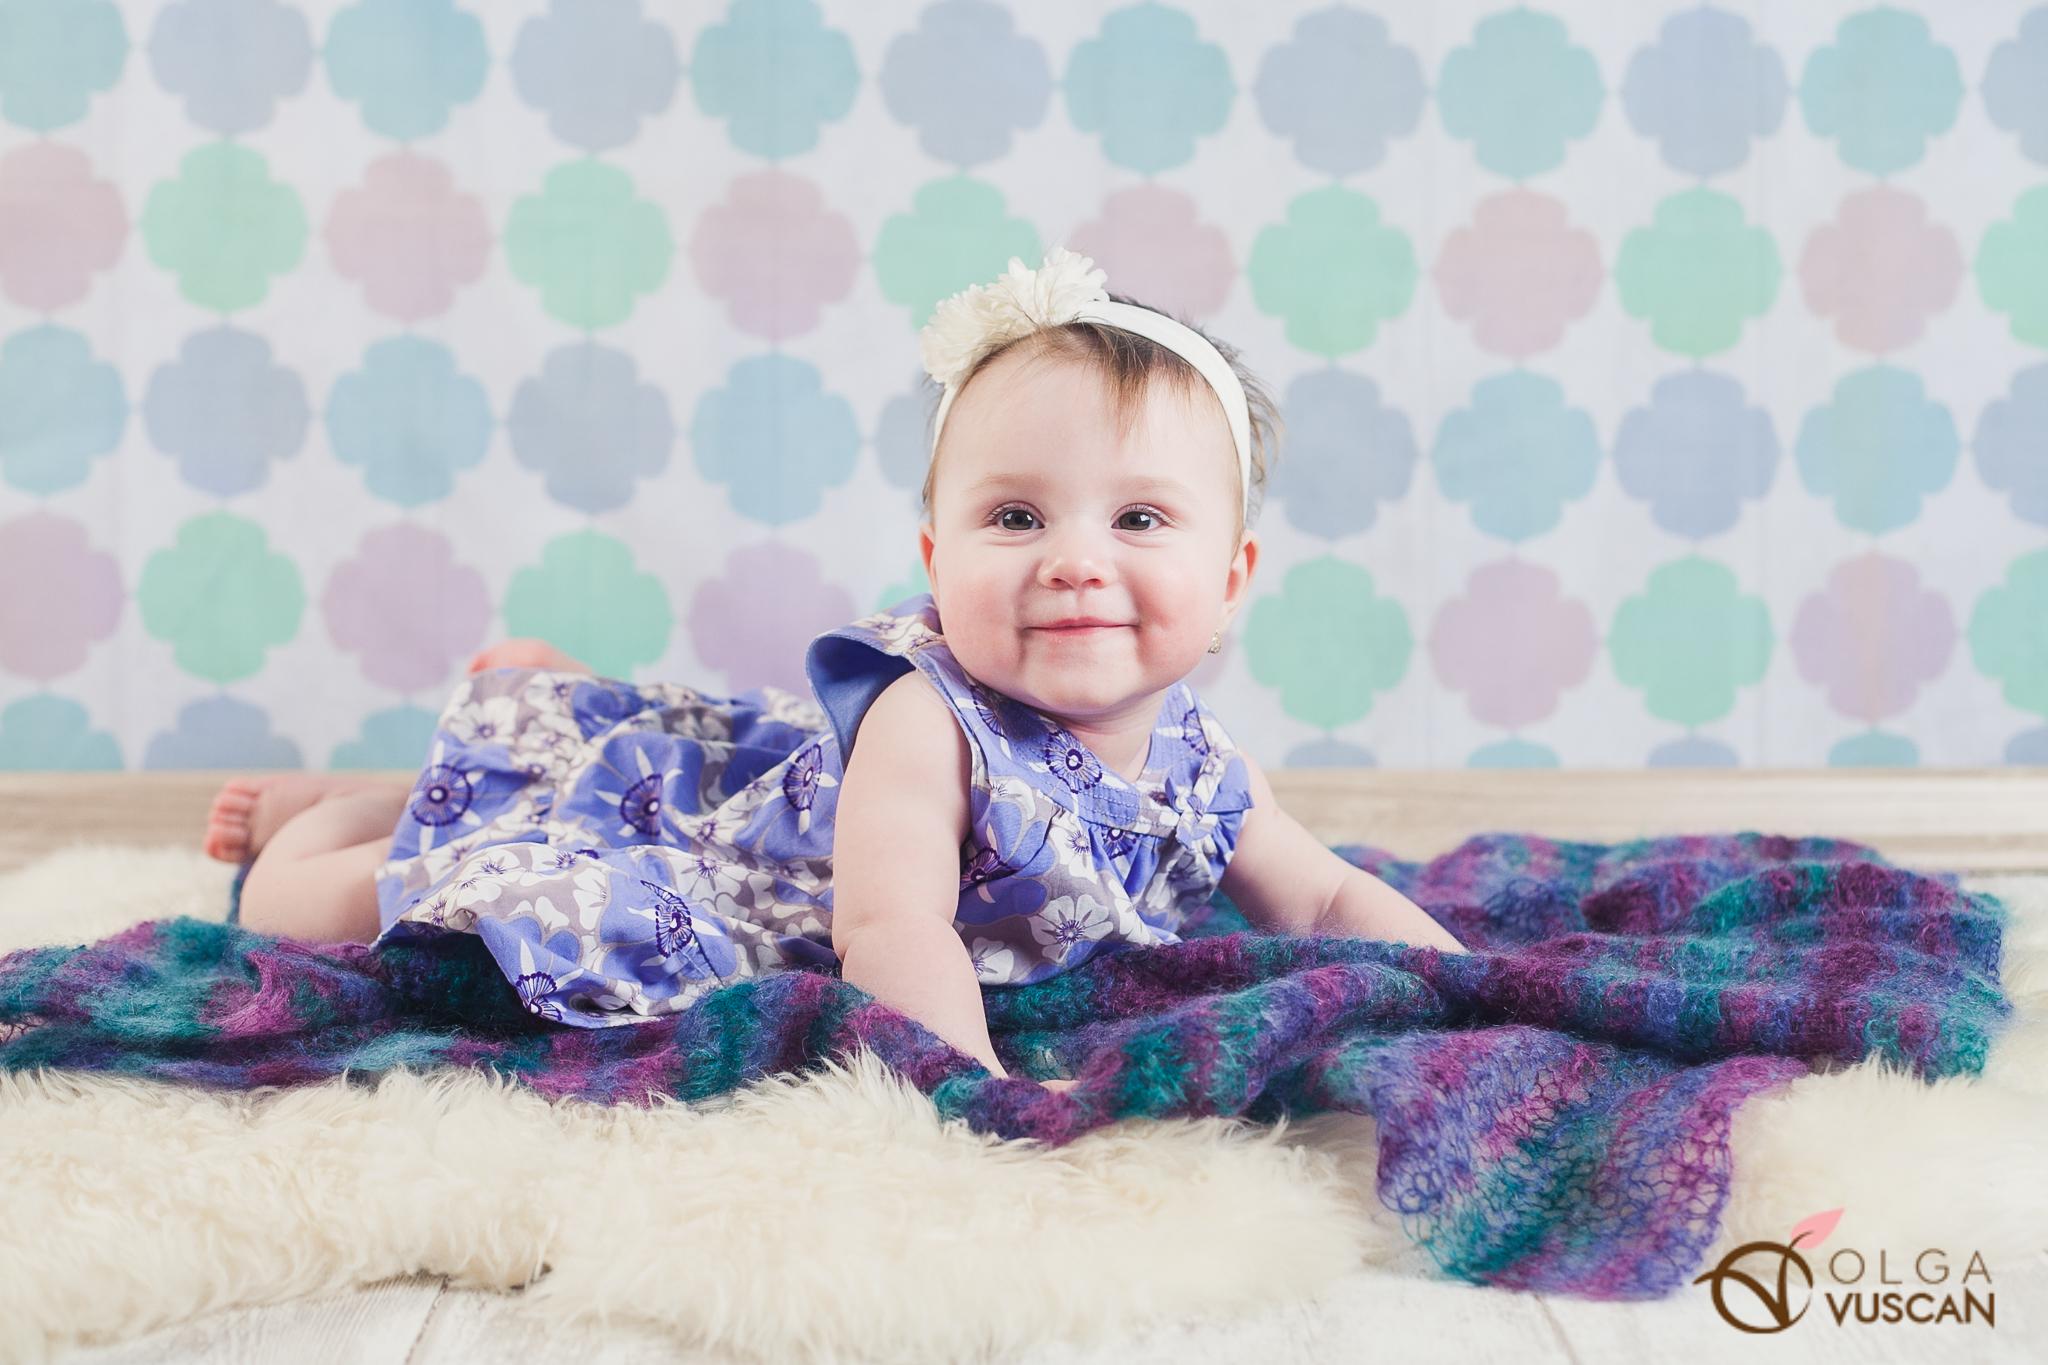 Emma_sedinta foto de copii in studio_Olga Vuscan